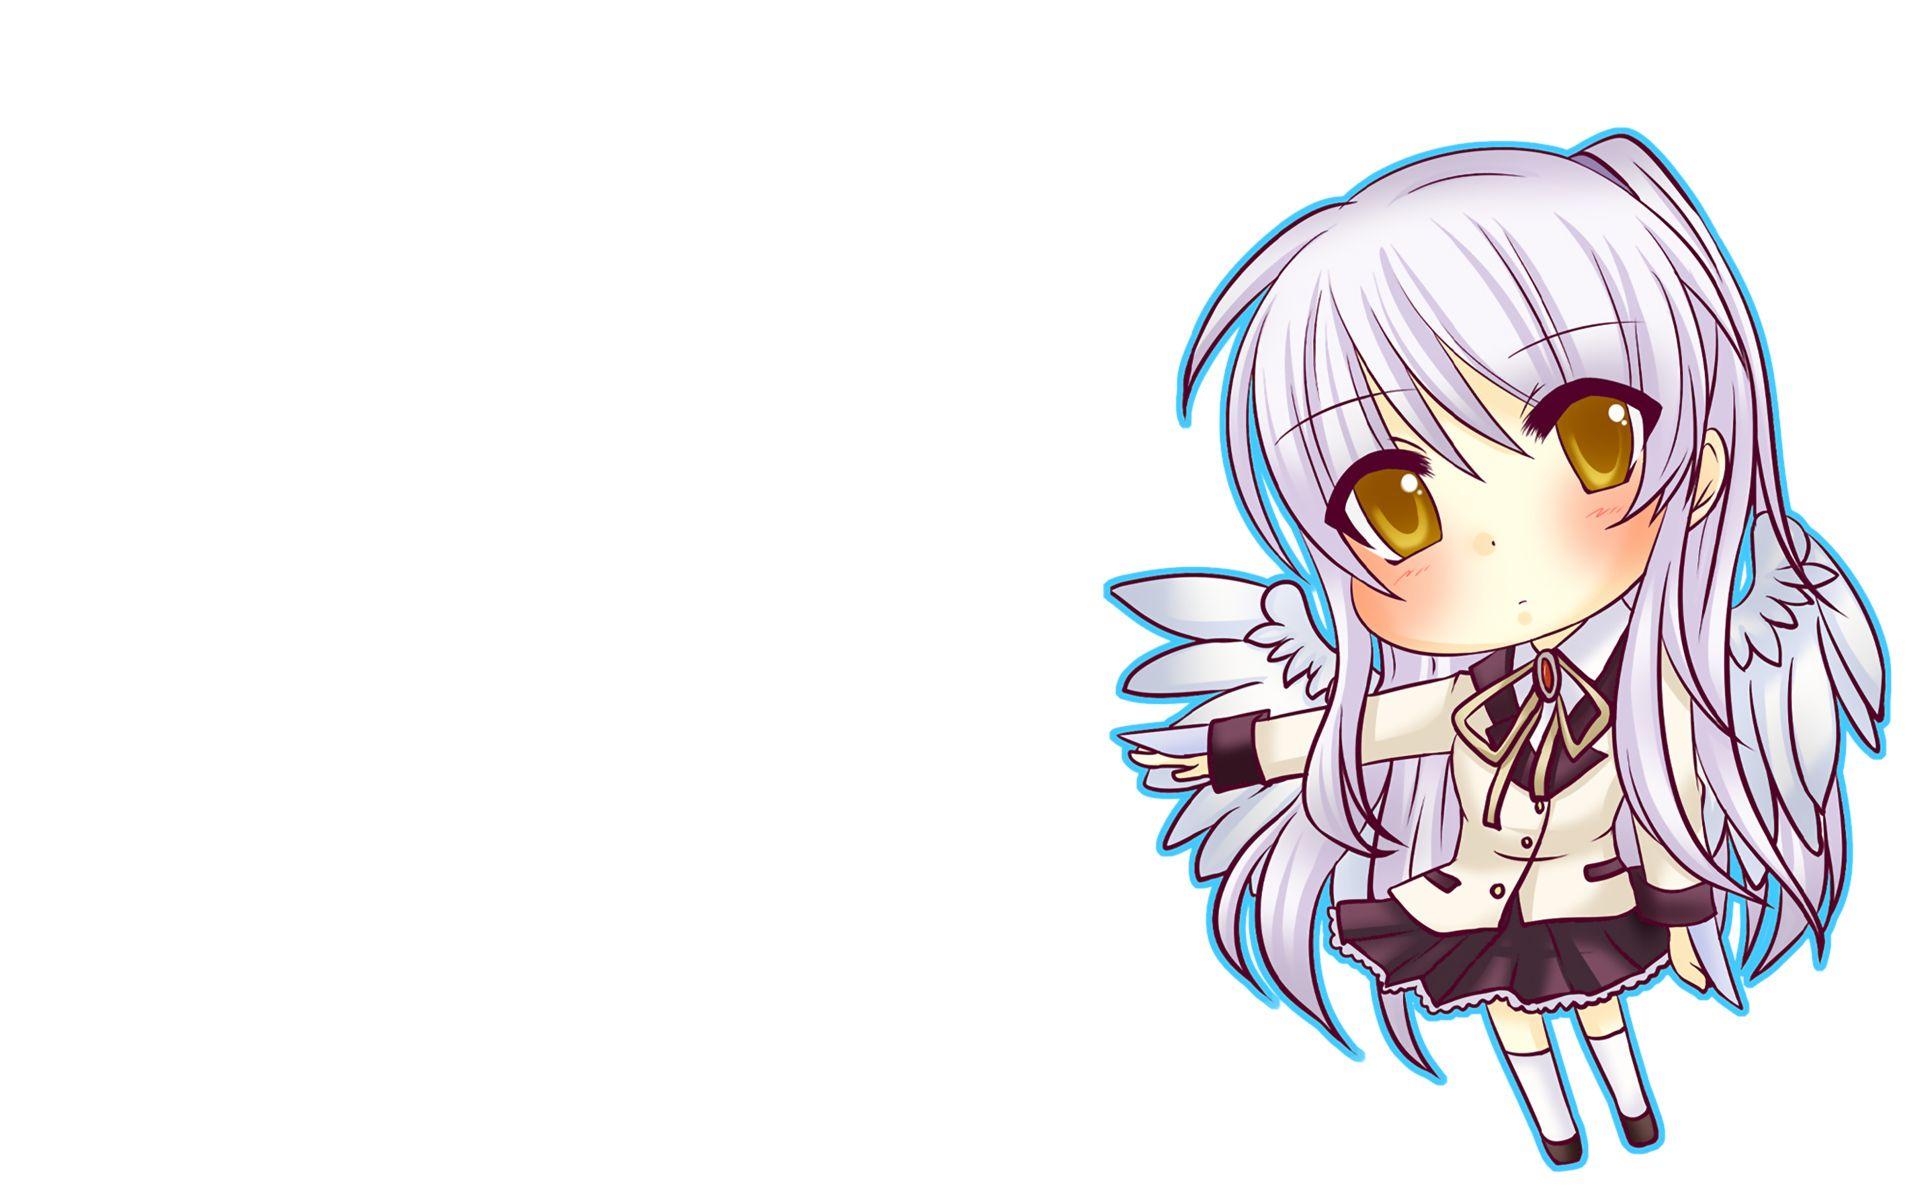 Pin by 🌻Emily🌻 on anime Angel beats, Chibi, Anime